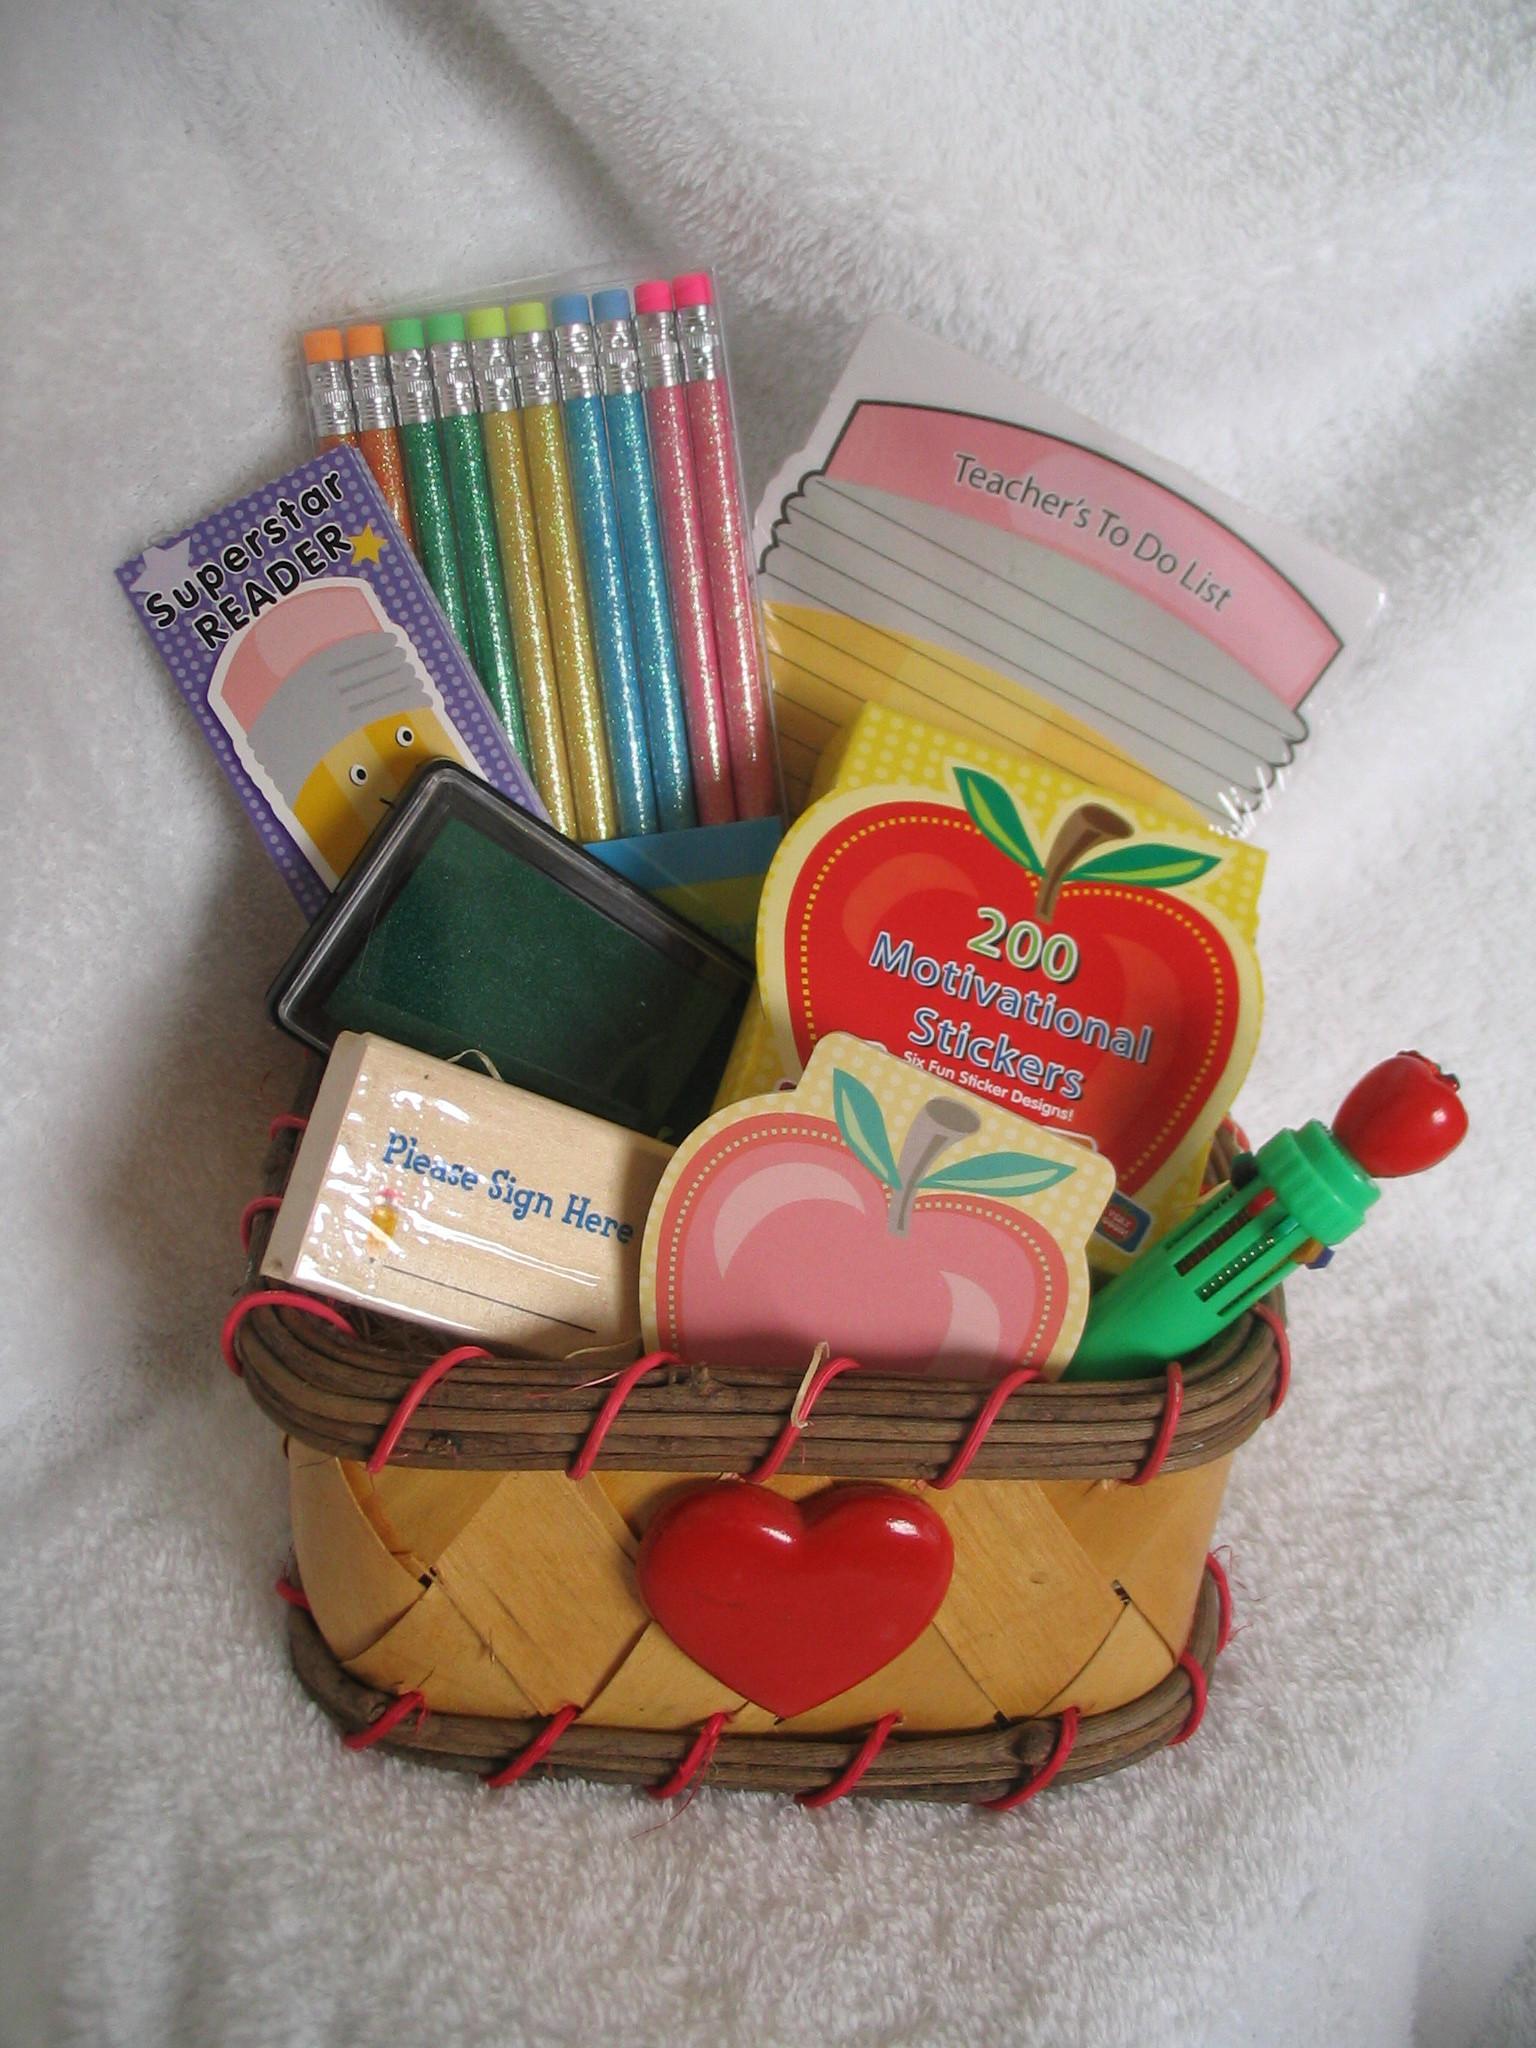 New Teacher Gift Basket Ideas  The Basket Case